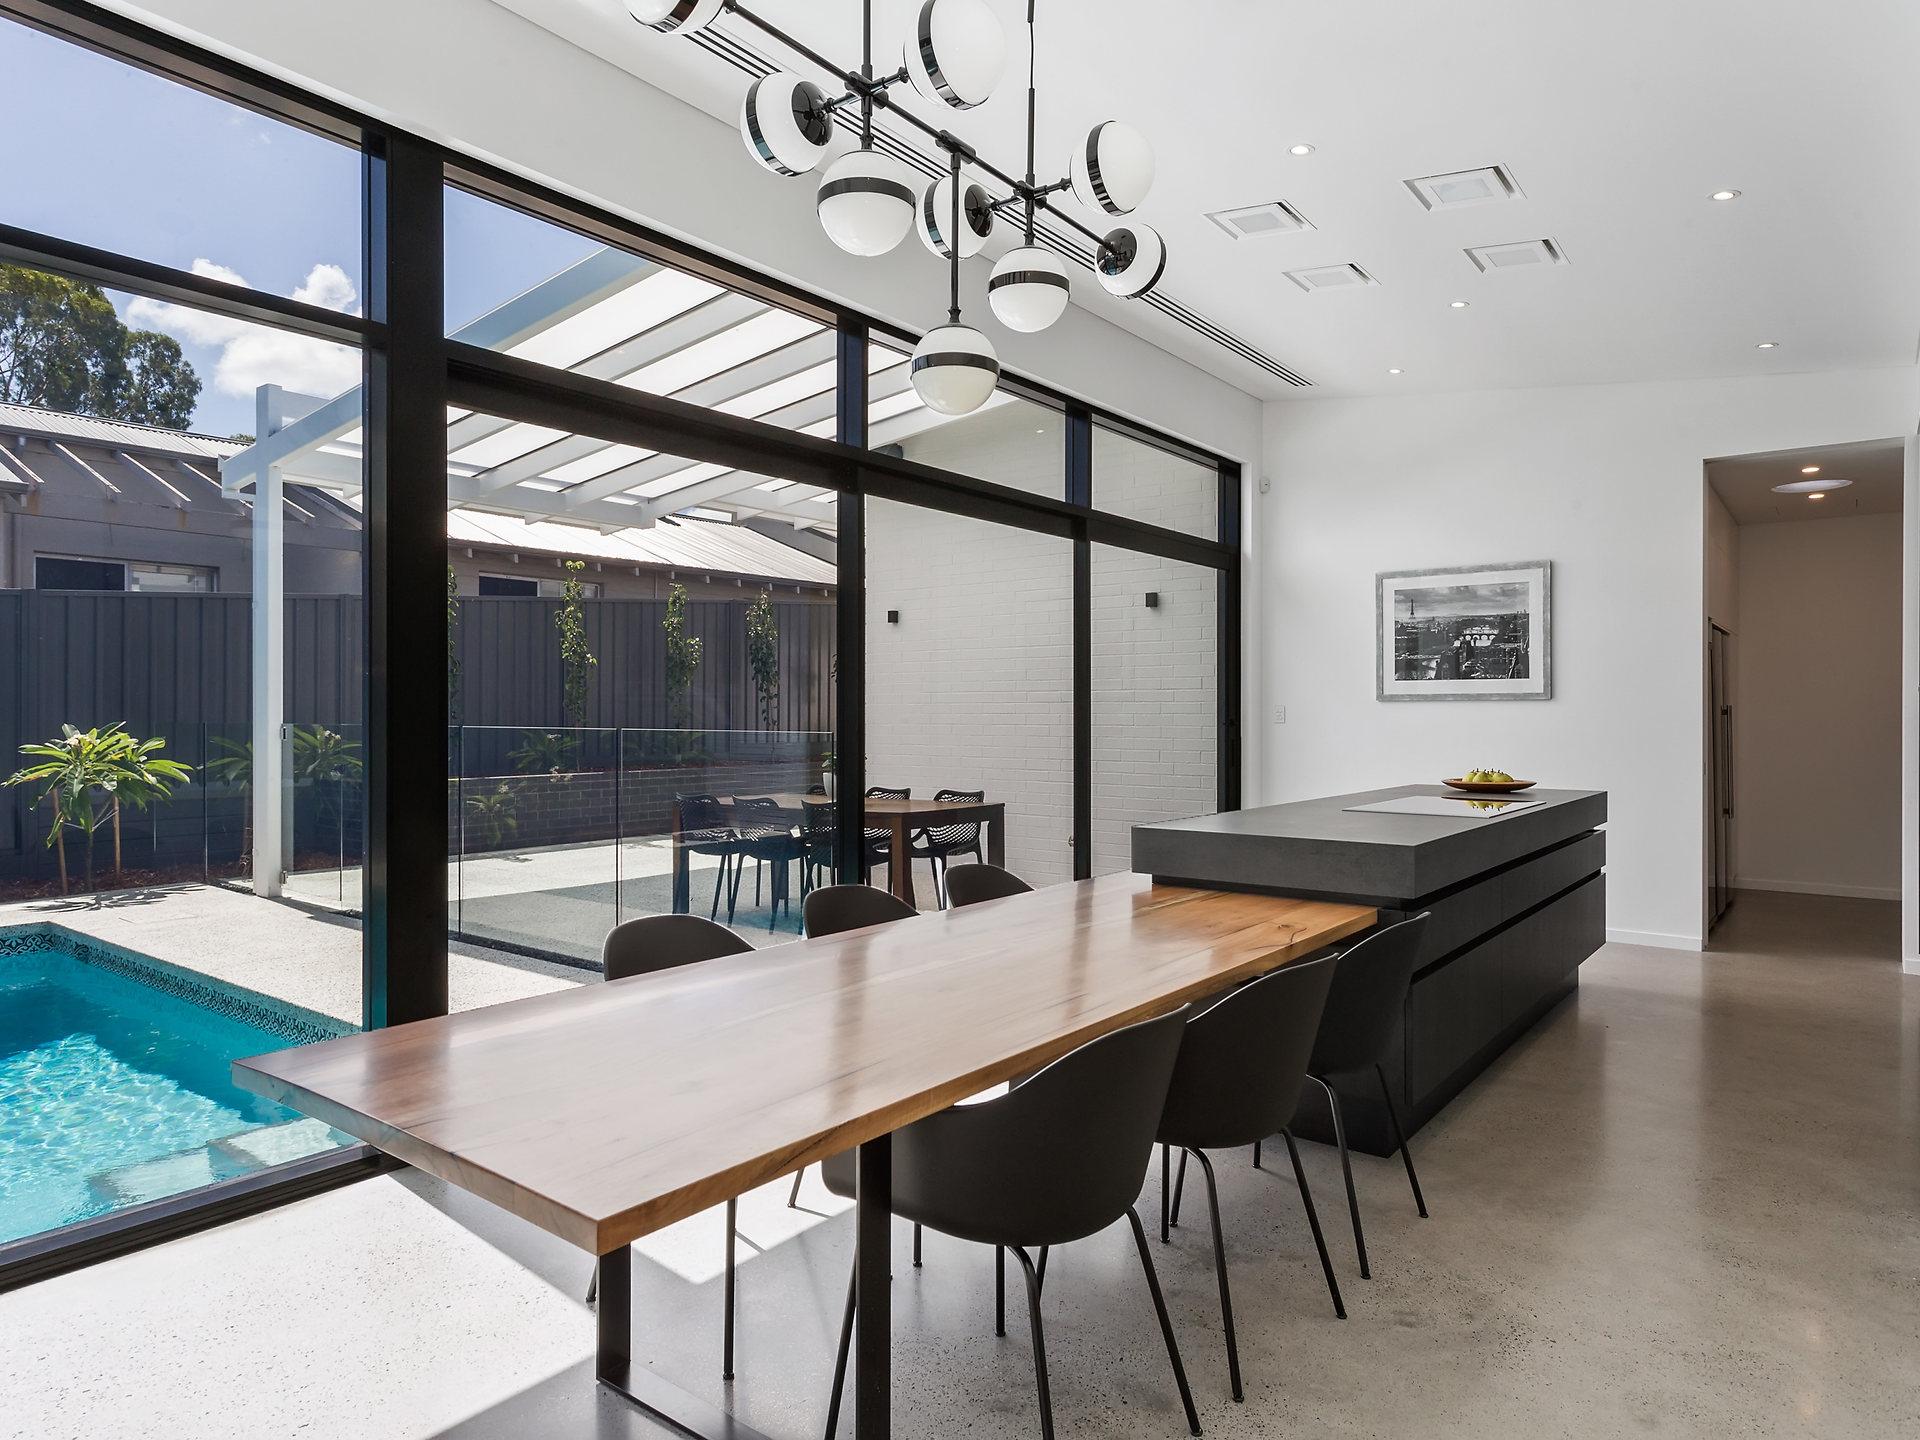 Schweigen's Paradigma by Frecan gana 2020 Good Design Award